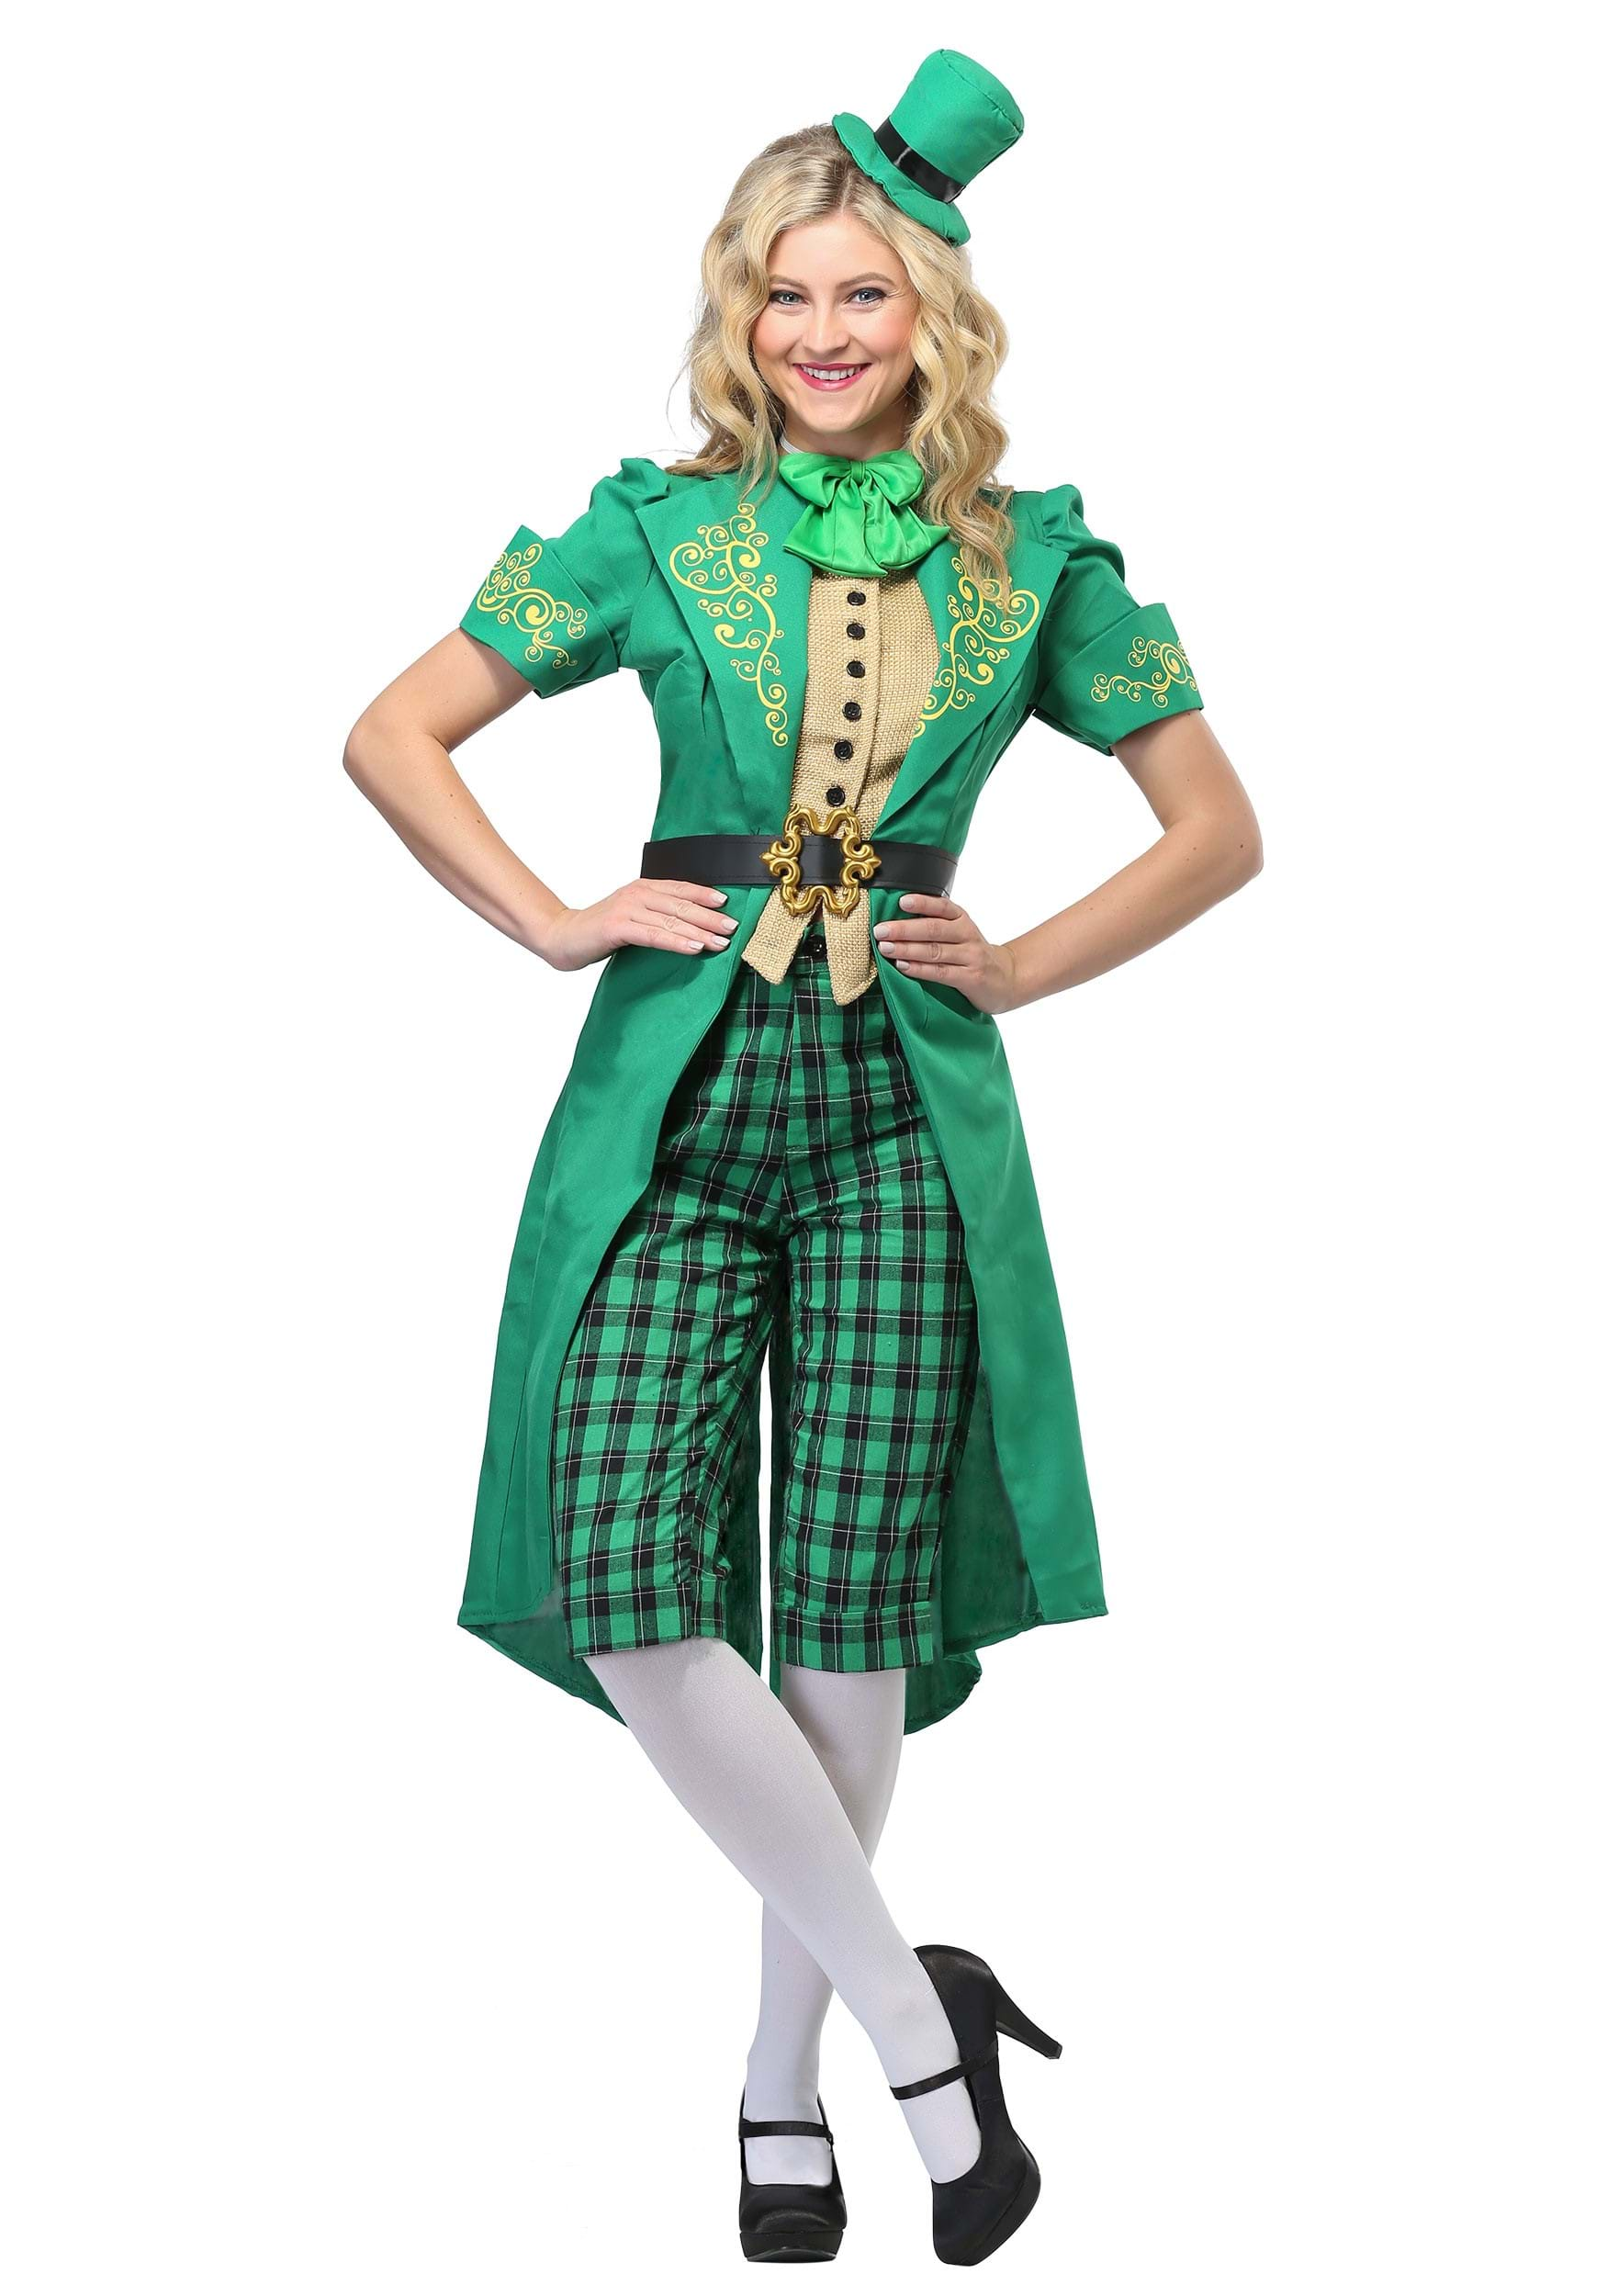 Womenu0027s Charming Leprechaun Costume  sc 1 st  Halloween Costumes UK & St. Patricku0027s Day Costumes - Adult Kids Saint Patricku0027s Costume